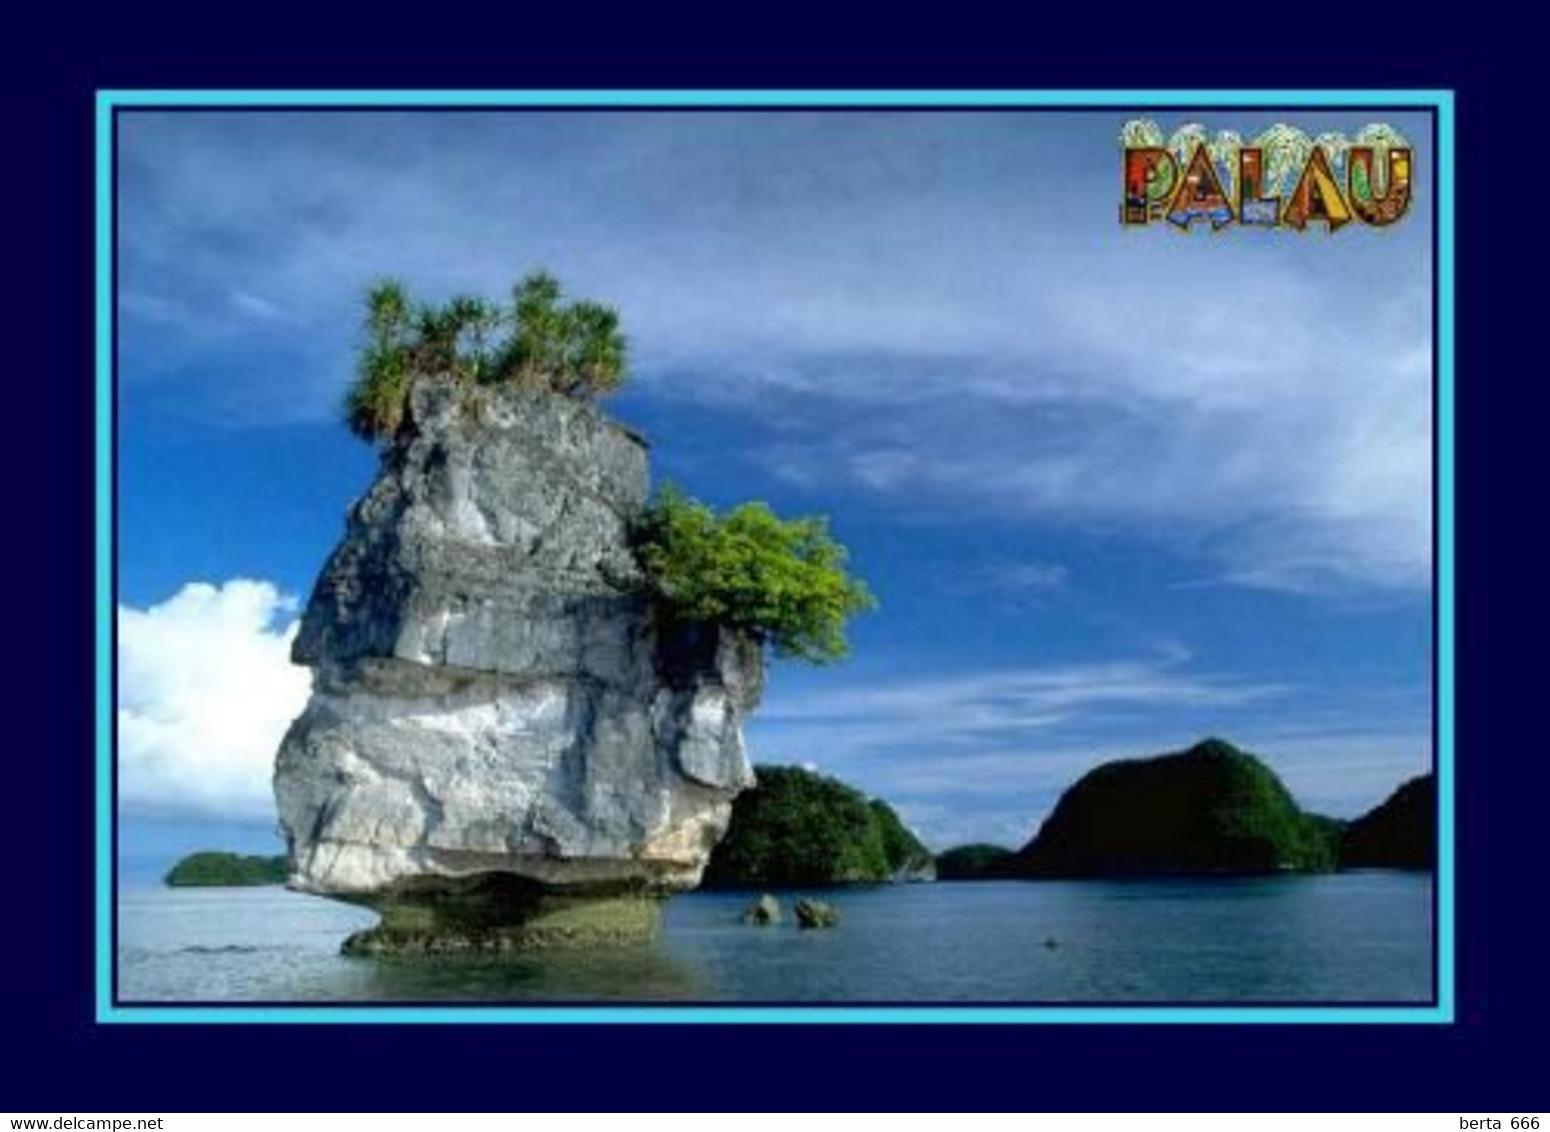 Palau Stack Rock UNESCO New Postcard - Palau